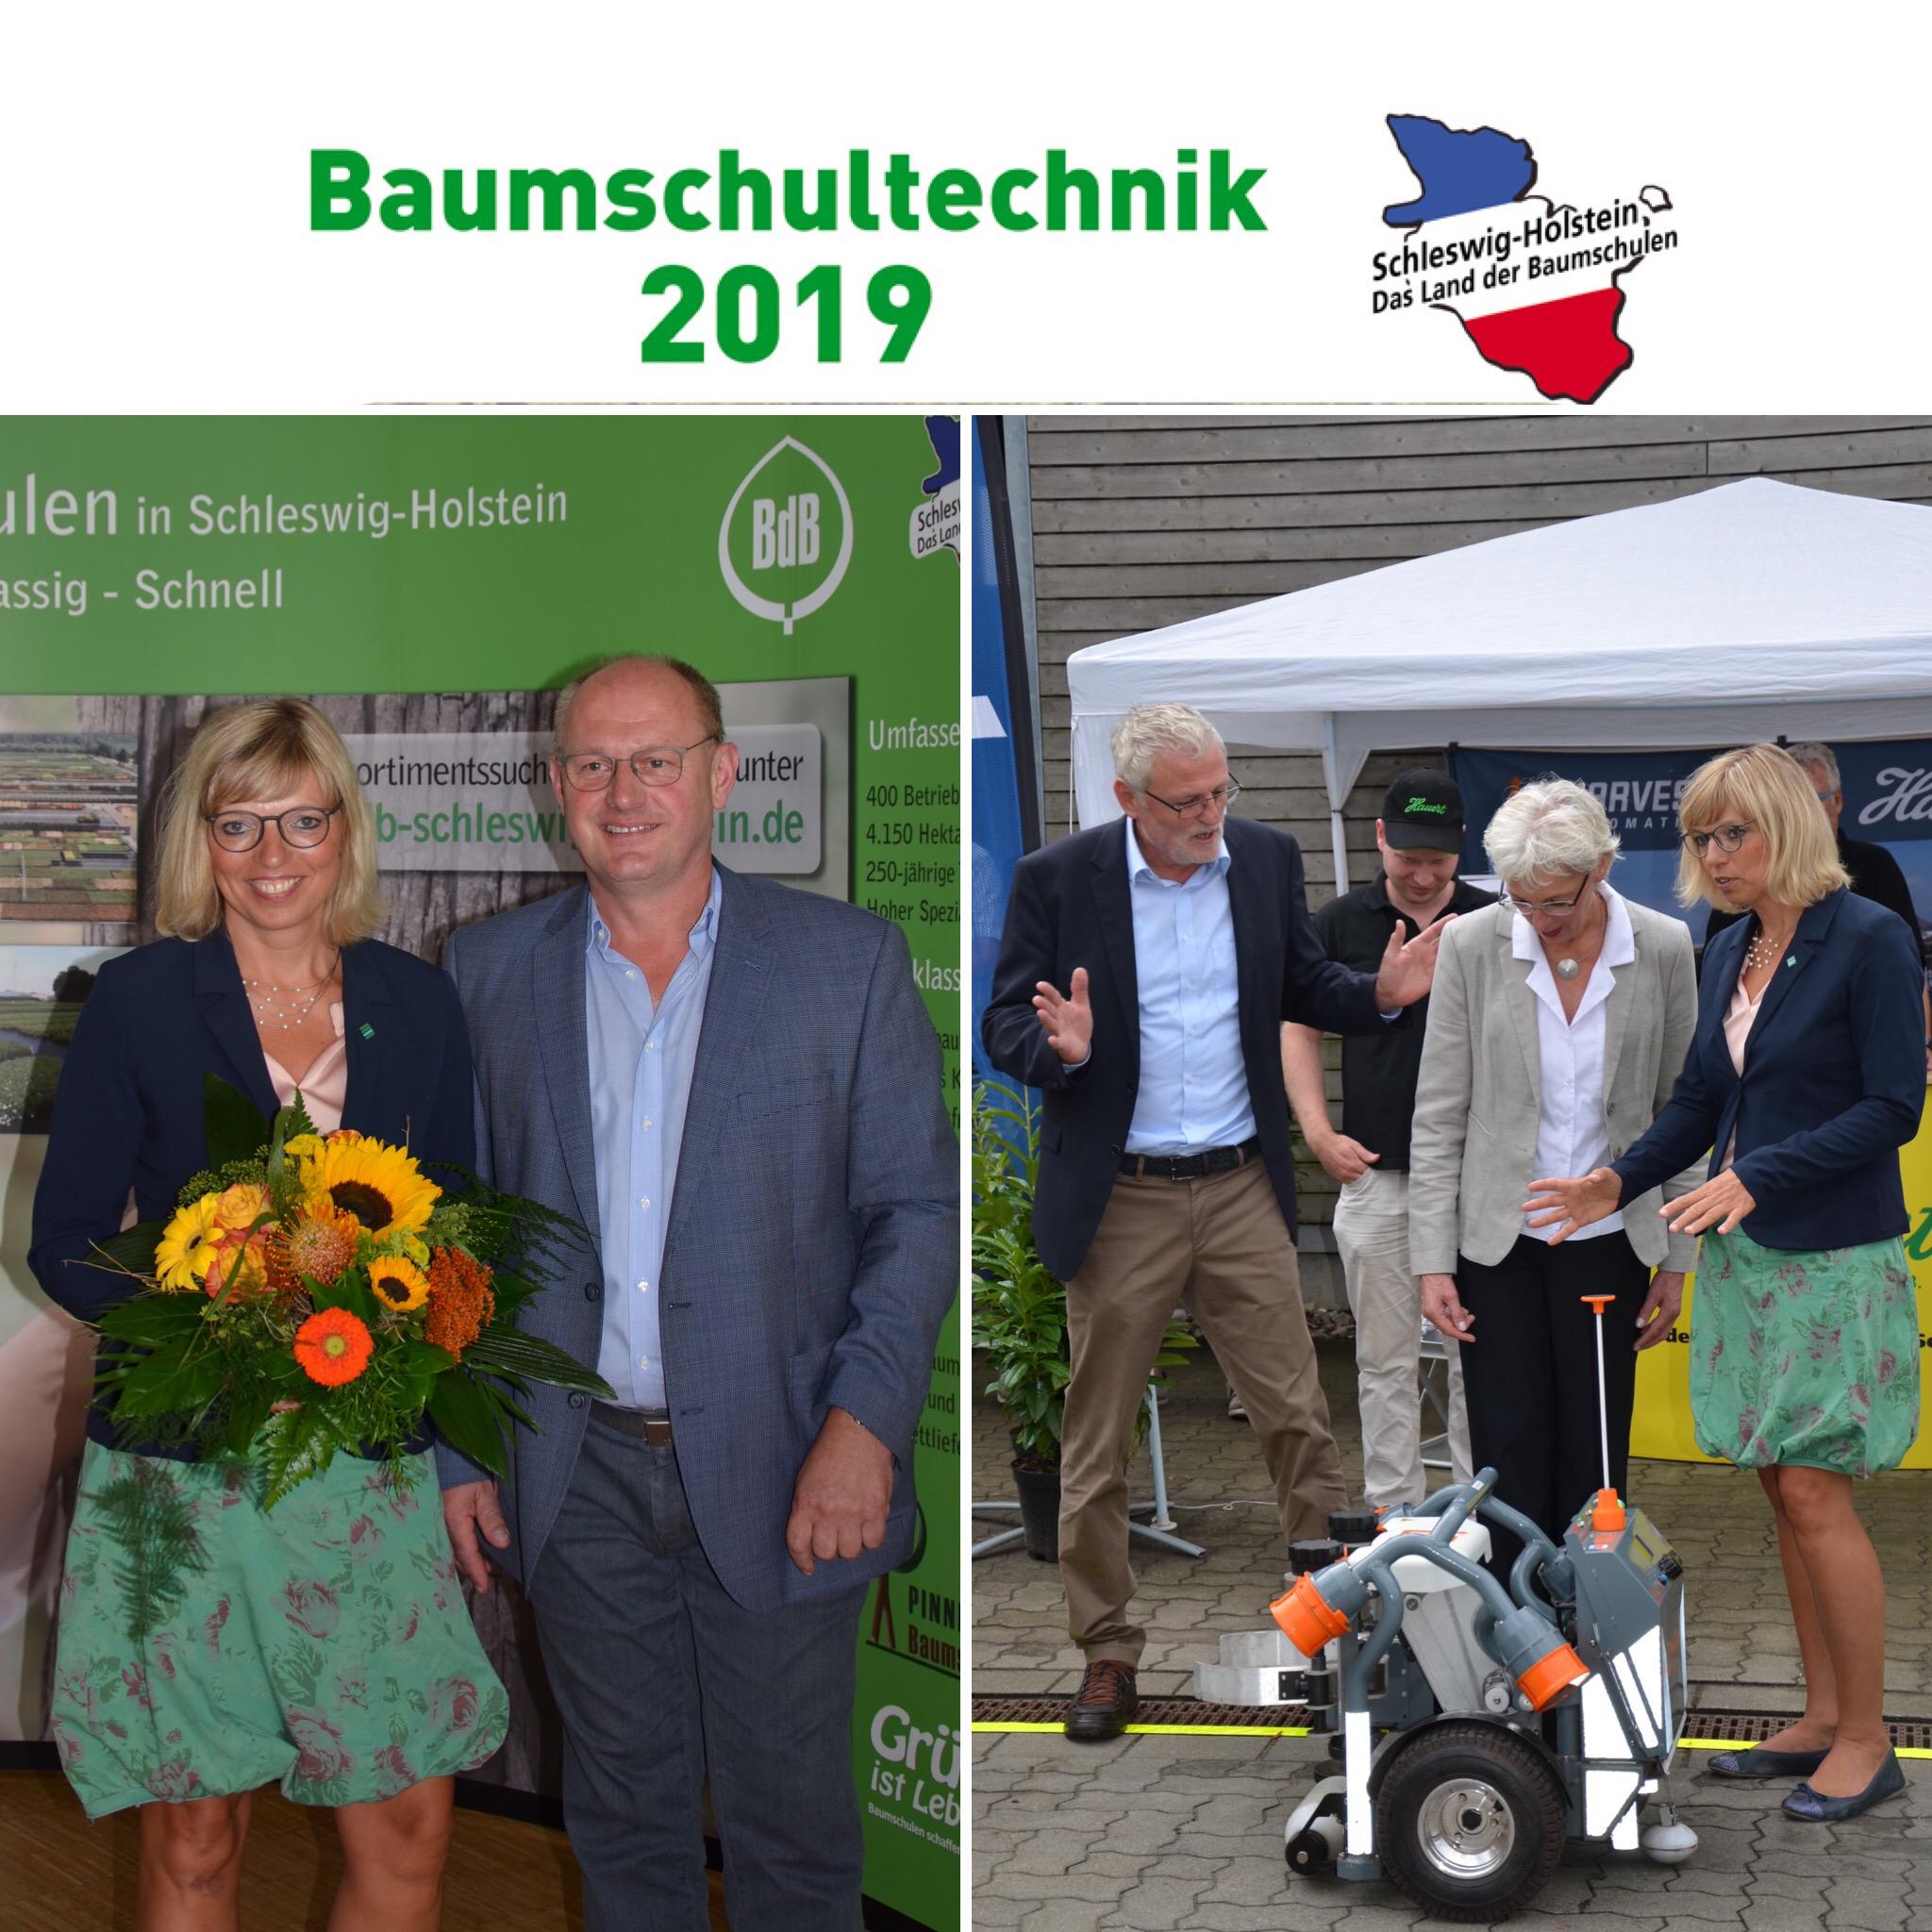 Baumschultechnik 2019